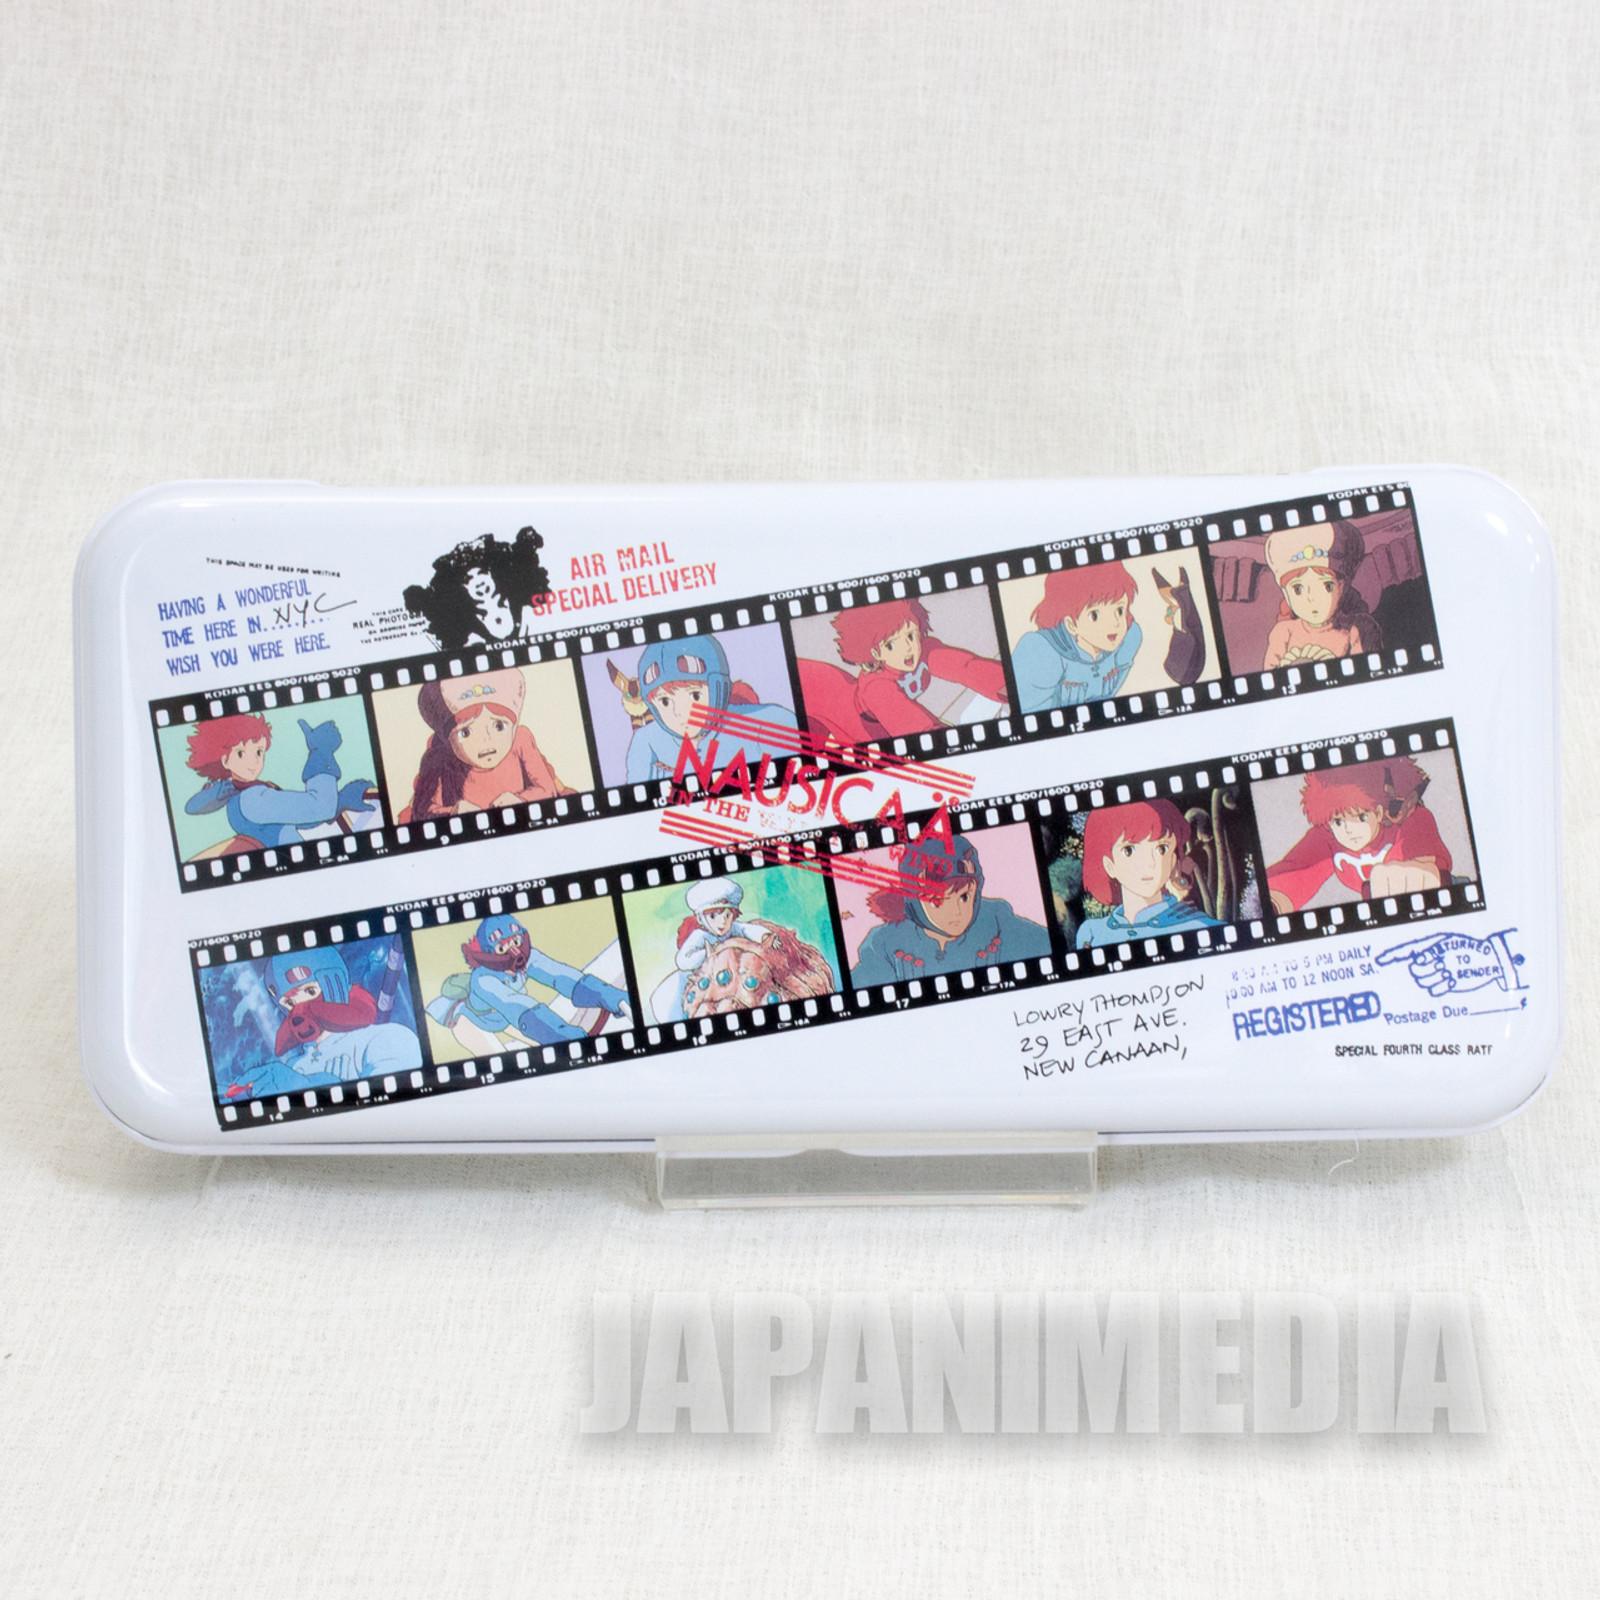 Retro RARE Nausicaa of the Valley Can Pen Case Movic Ghibli JAPAN ANIME